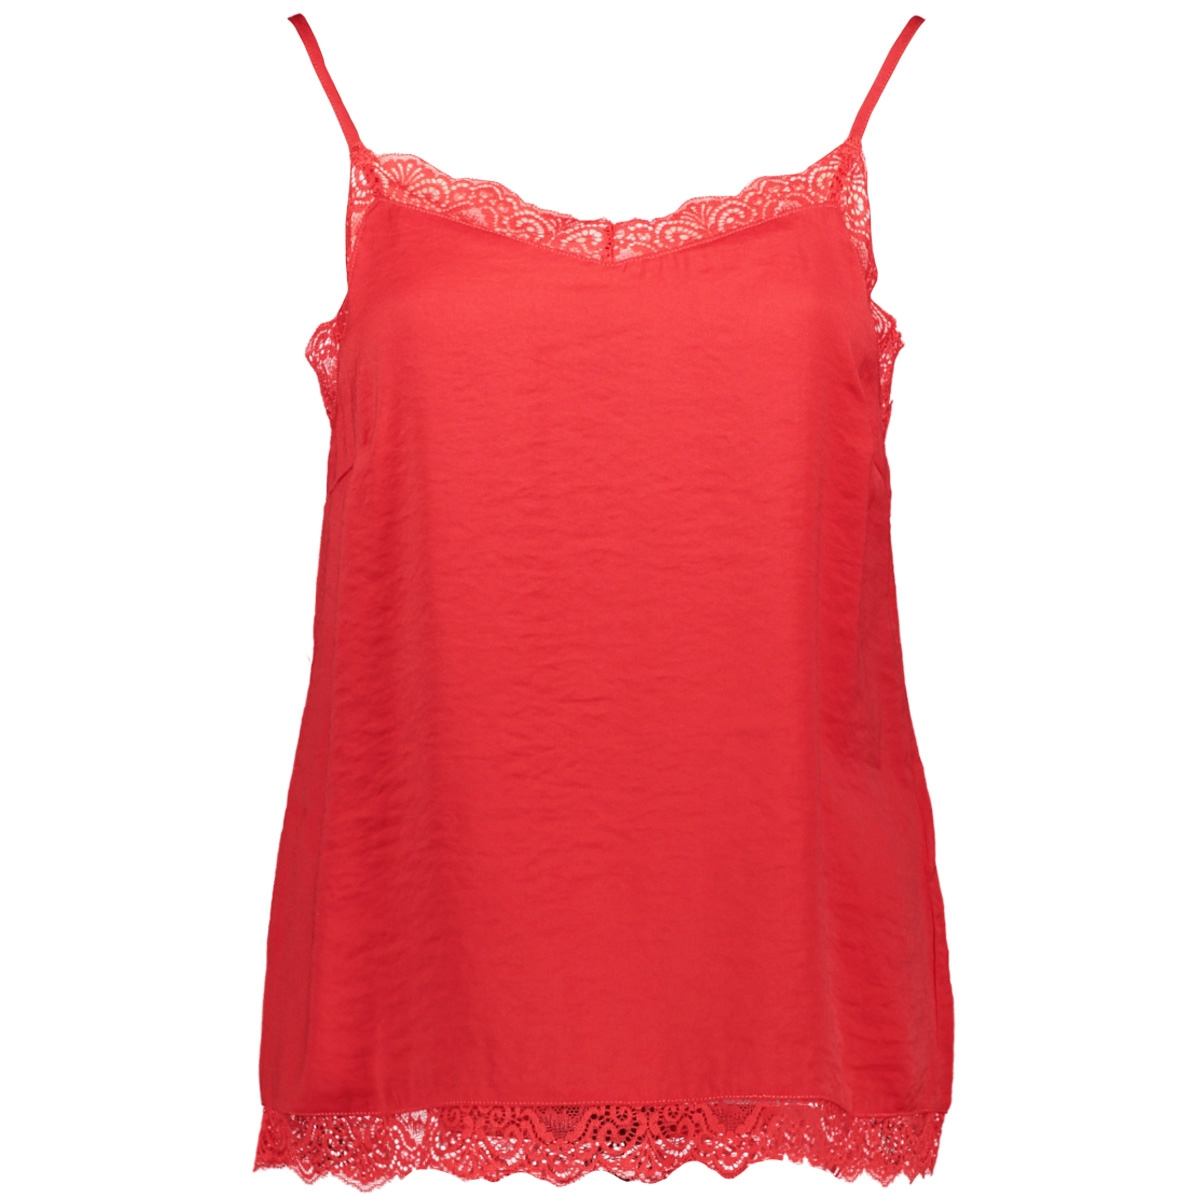 vicava lace singlet - fav 14045939 vila top racing red